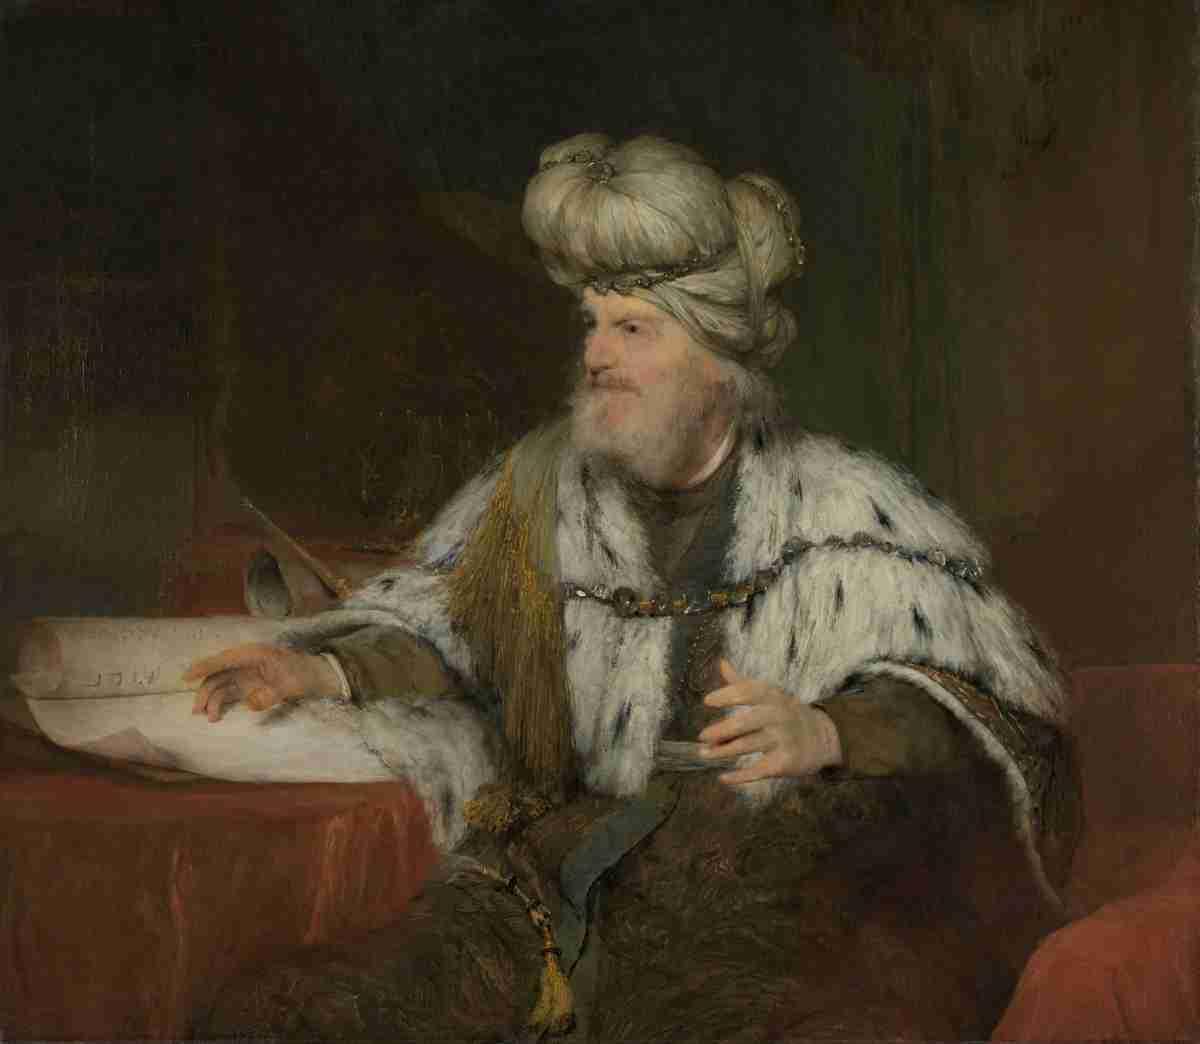 Koning_David_Aert_de_Gelder.wikipedia